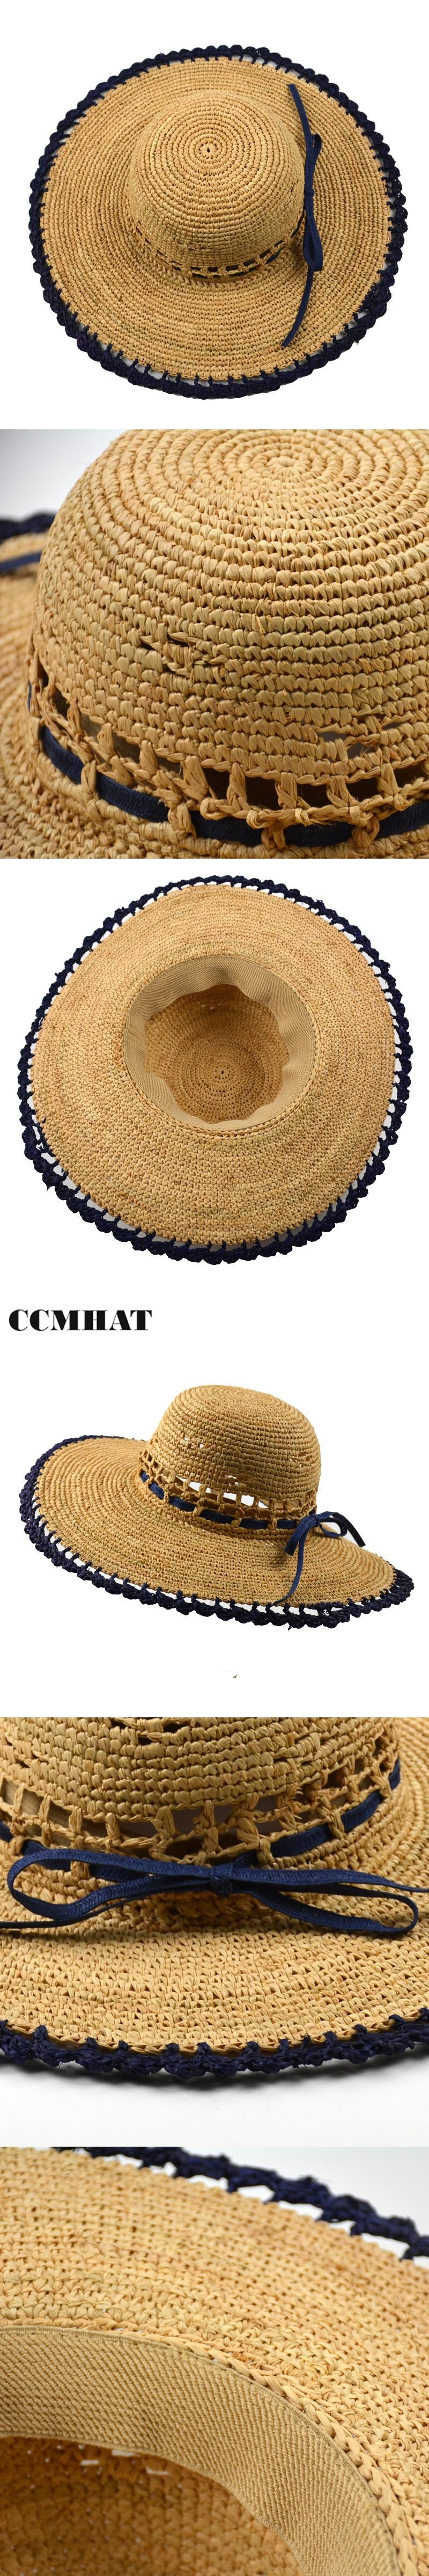 Hollow Raffia Sun Hats For Adult Fashion Foldable Soft Raffia Straw Hats  Summer Women Sunscreen Breathable 052b2fa15b15